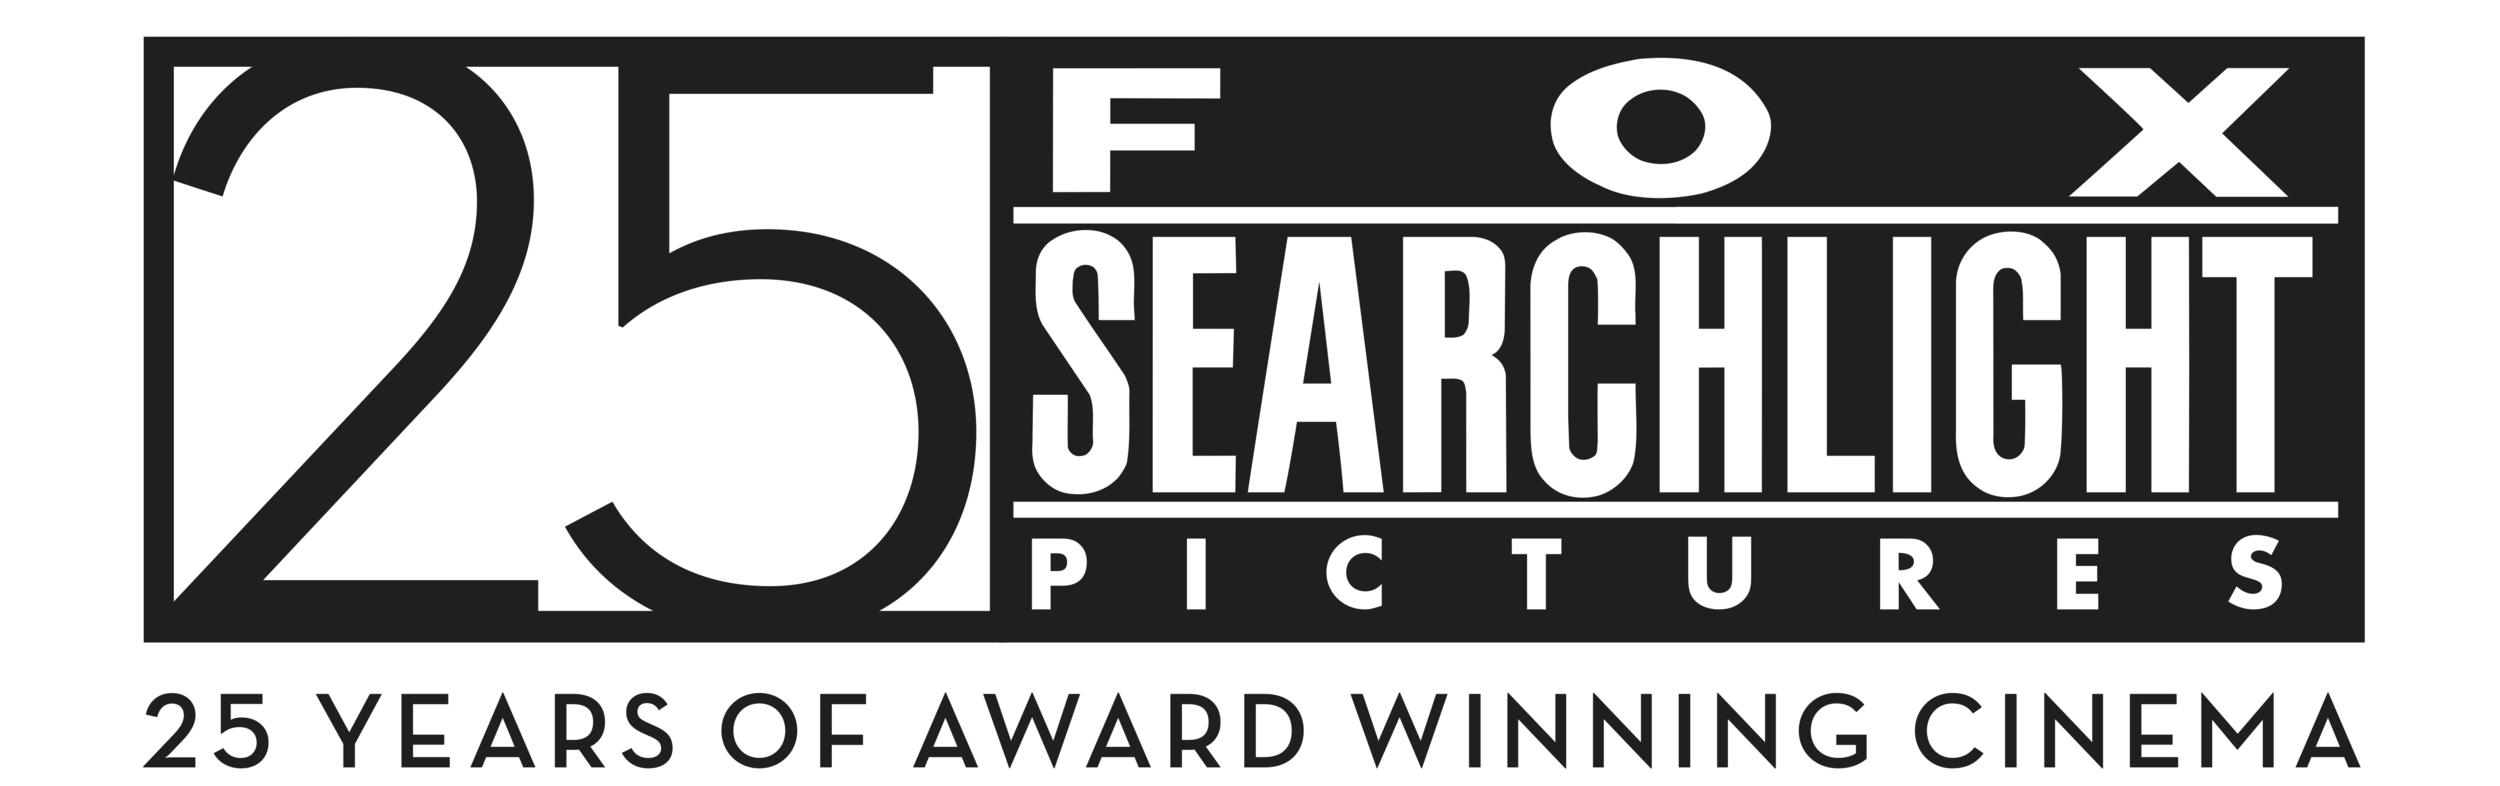 25 Years FSL Award Winning Cinema.png